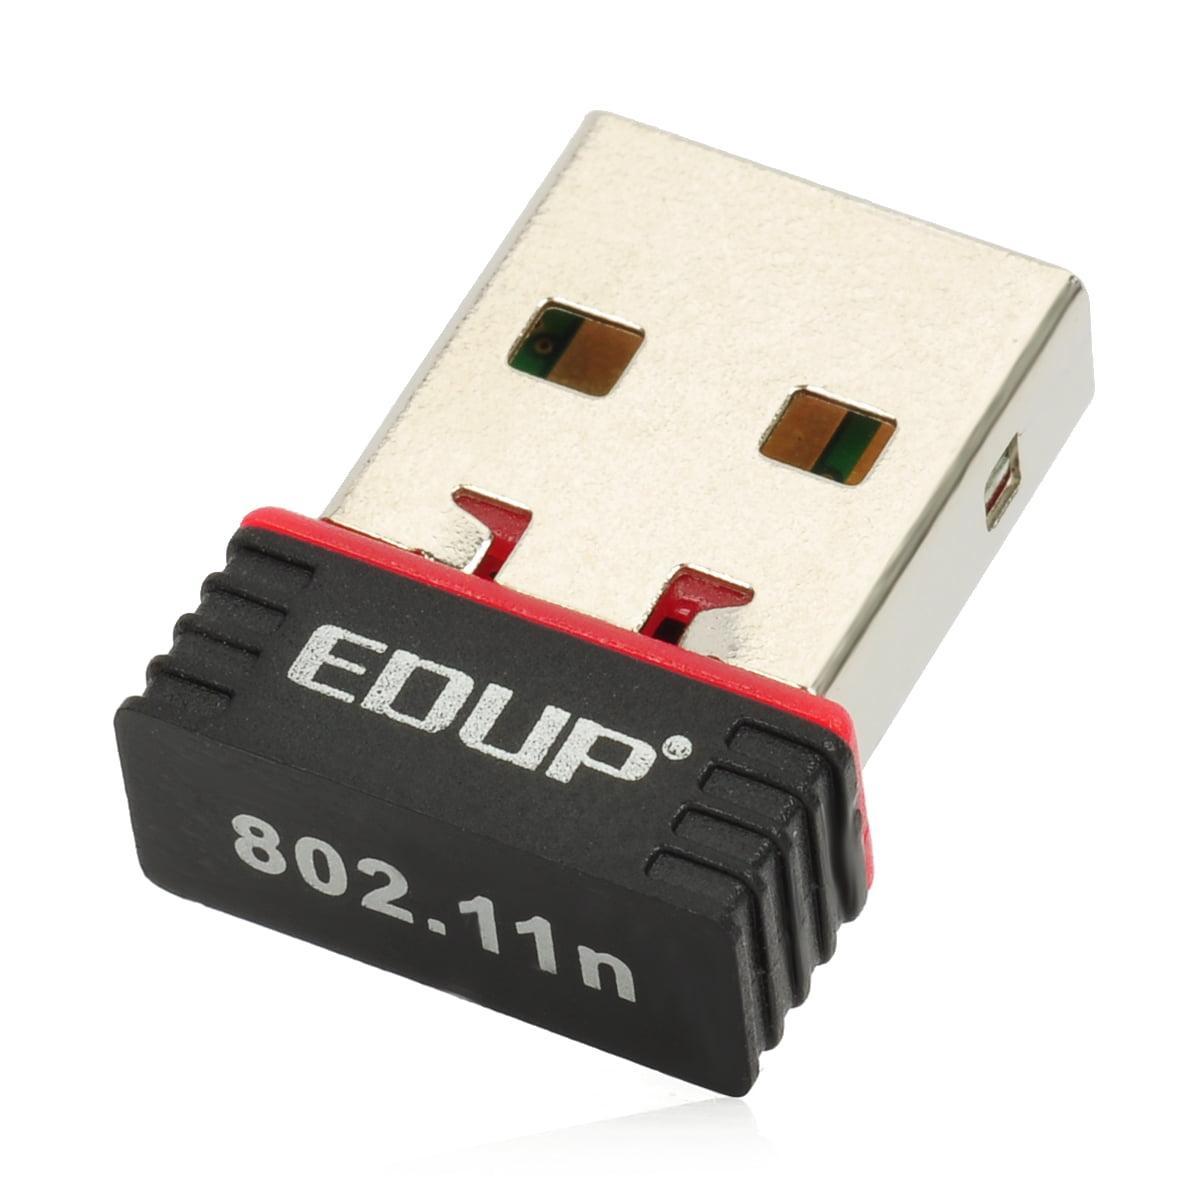 Mini 150Mbps Nano USB WiFi Wireless WLAN Network Adapter ...